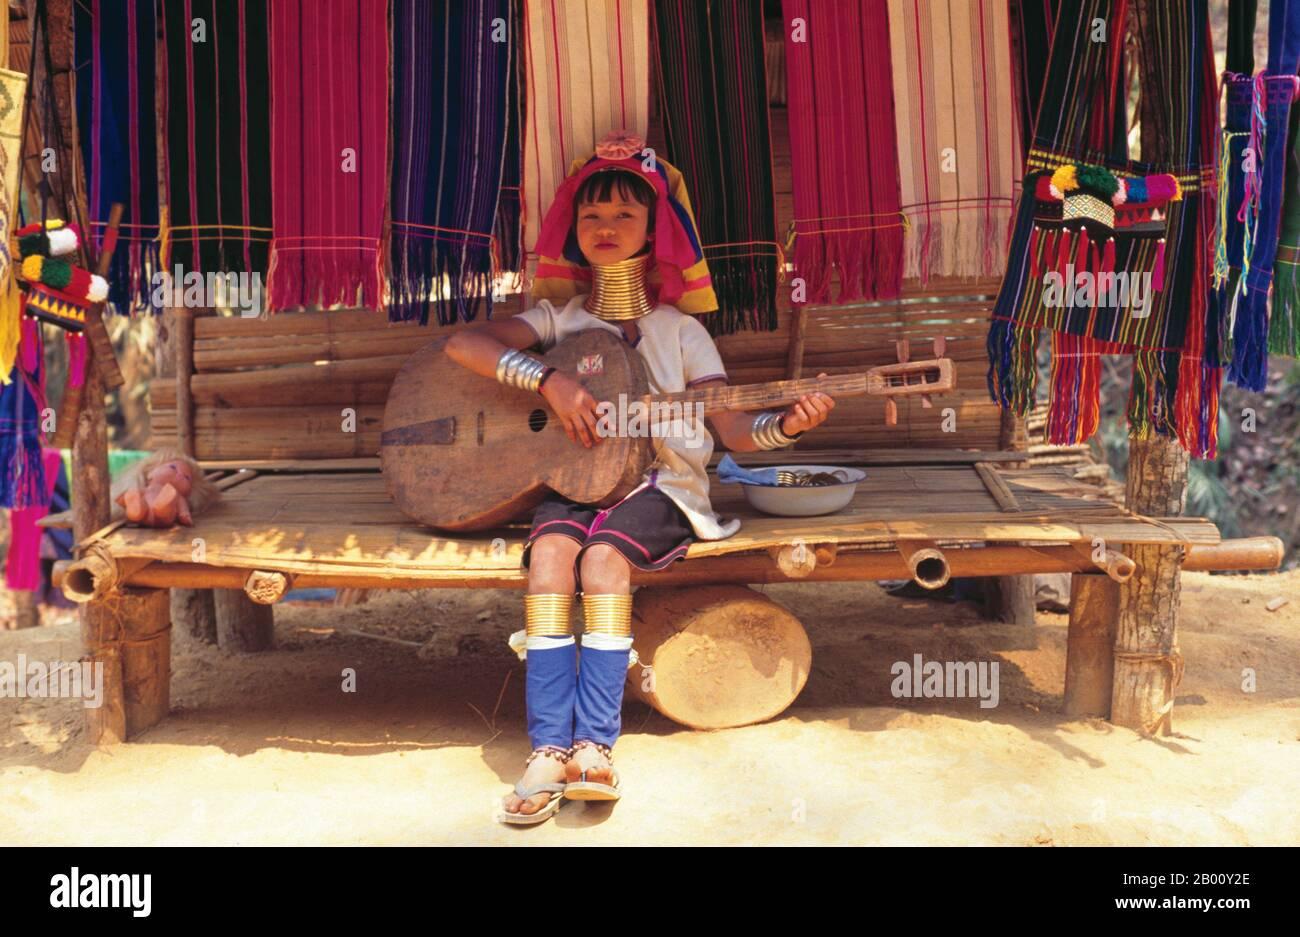 Thailand: Padaung (Long Neck Karen) playing a homemade guitar, village near Mae Hong Son.  The Padaung or Kayan Lahwi or Long Necked Karen are a subgroup of the Kayan, a mix of Lawi tribe , Kayan tribe and several other tribes. Kayan are a subgroup Red Karen (Karenni) people, a Tibeto-Burman ethnic minority of Burma (Myanmar). Stock Photo